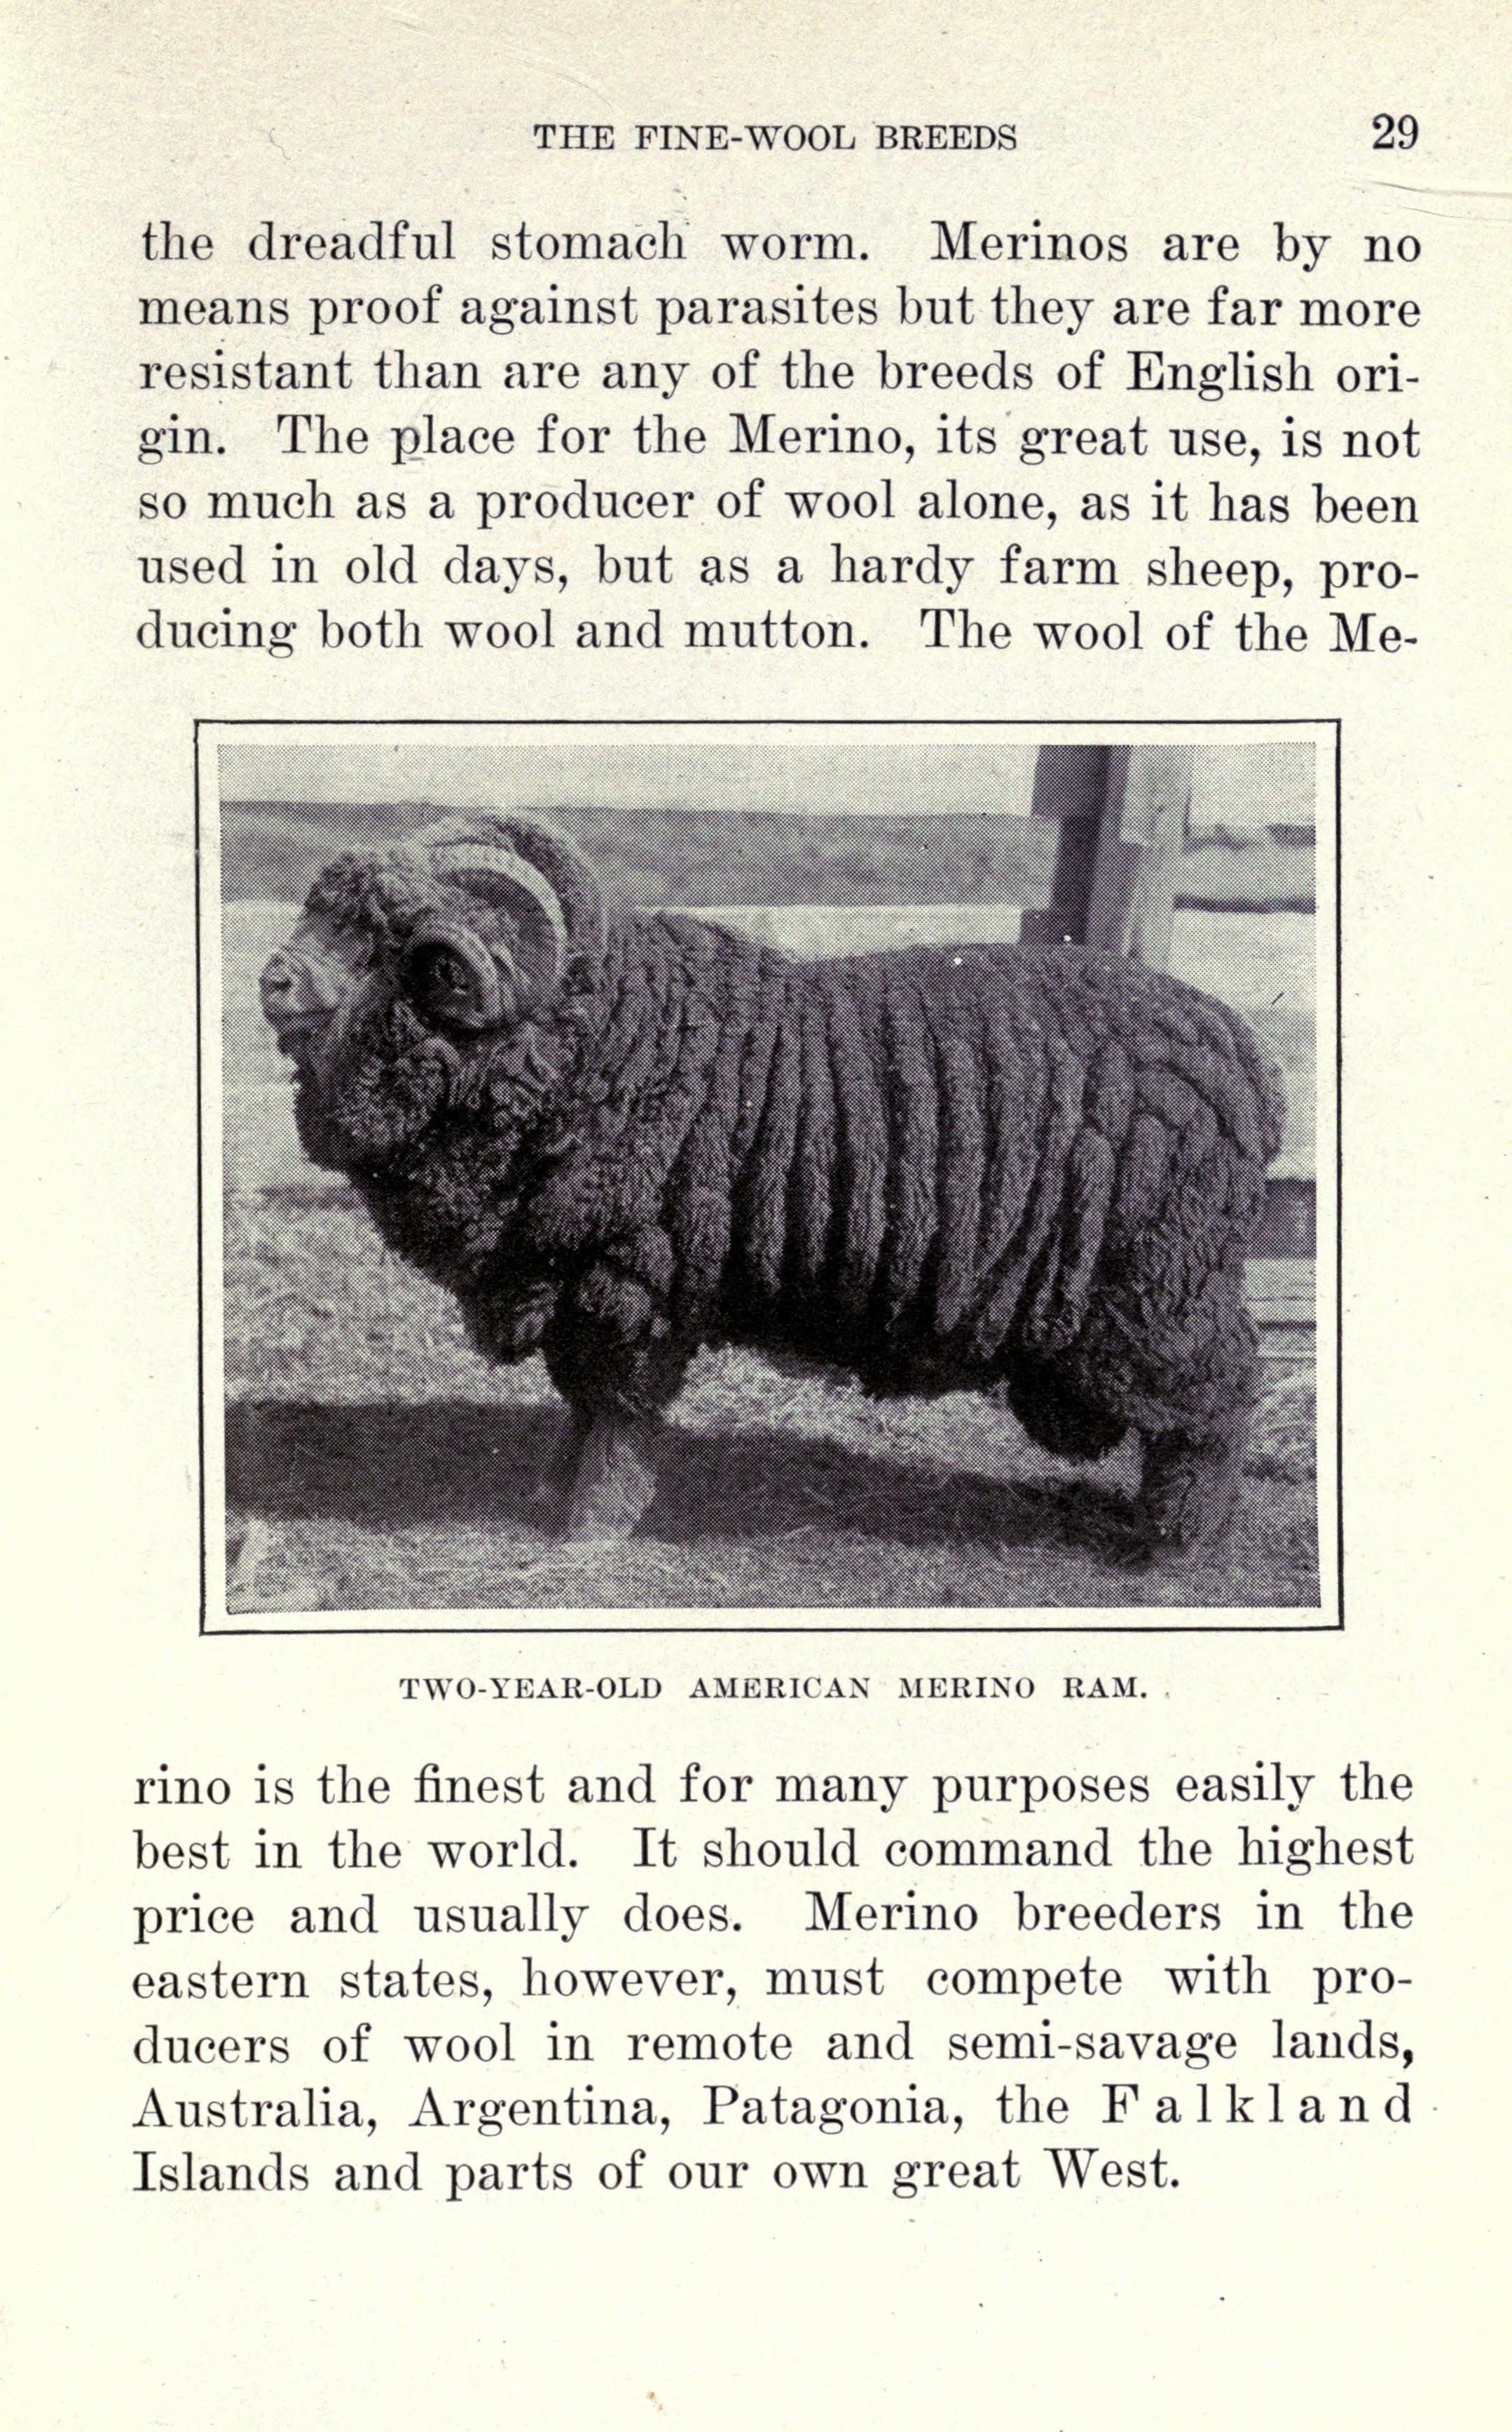 File:Sheep farming in America (Page 29) BHL20149728 jpg